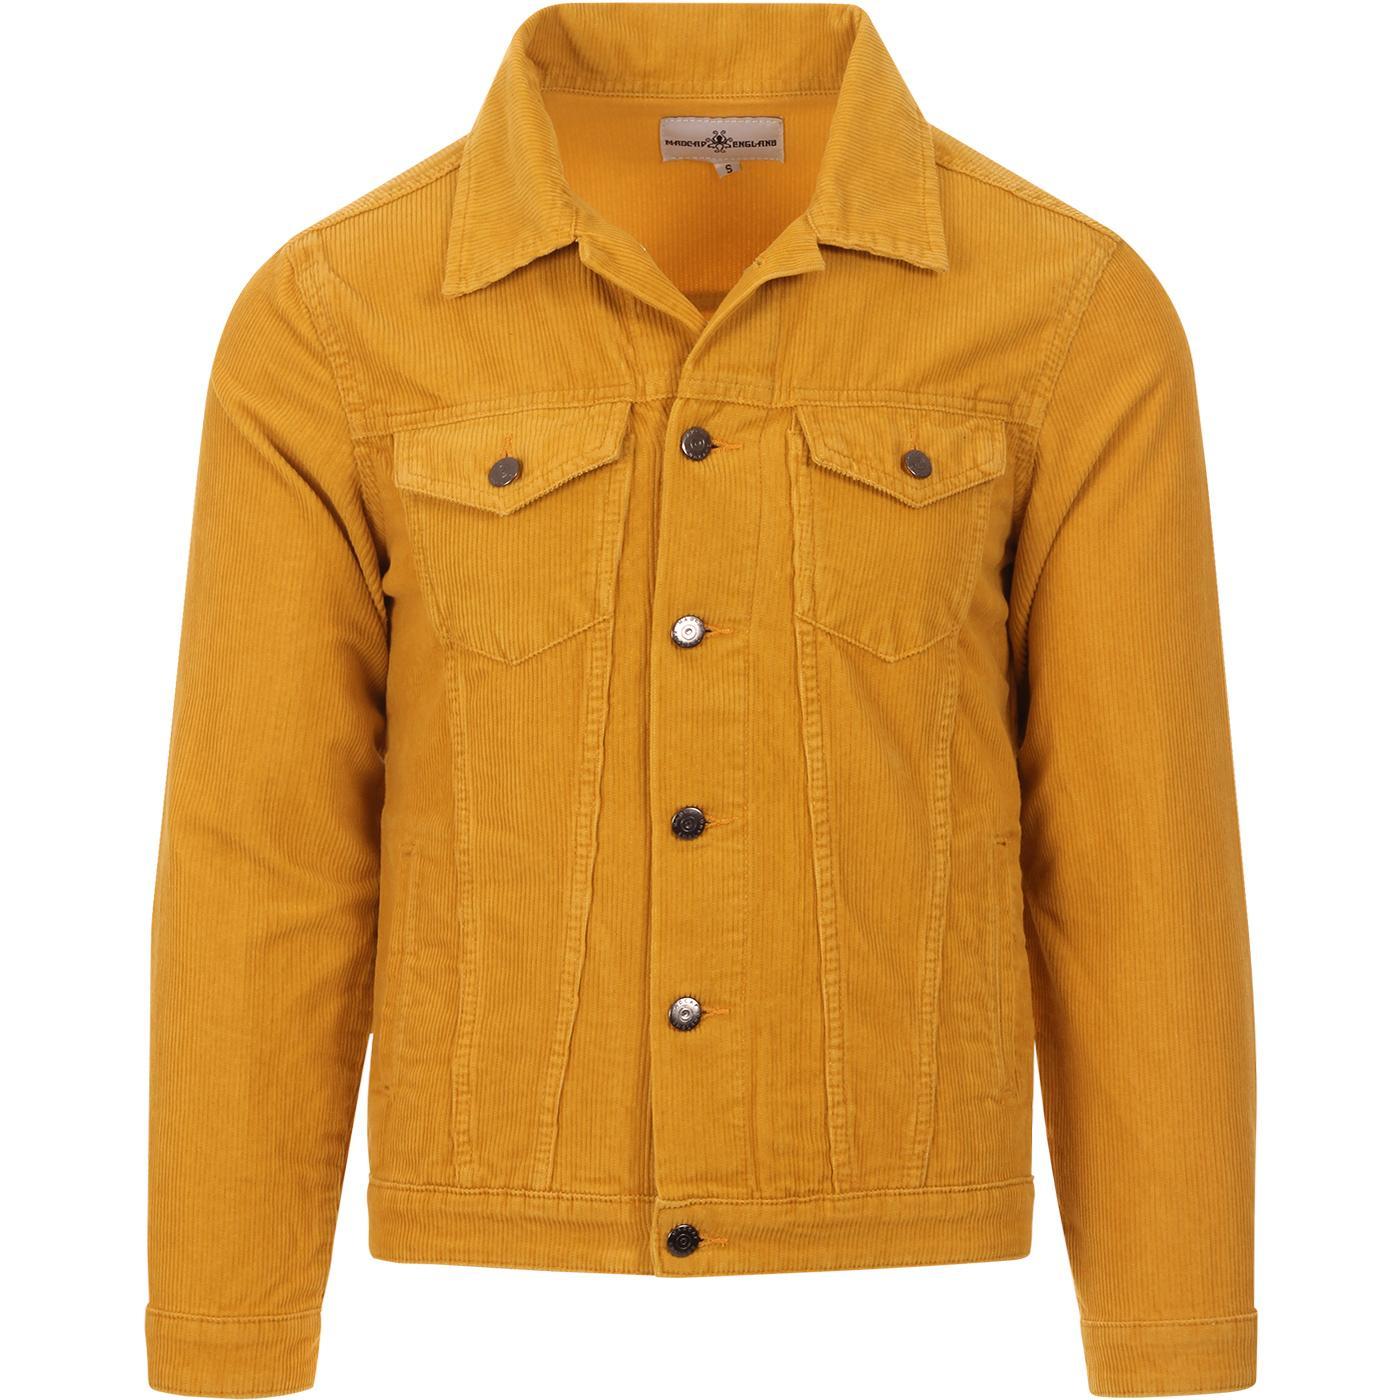 madcap england mens woburn mod cord western jacket gold